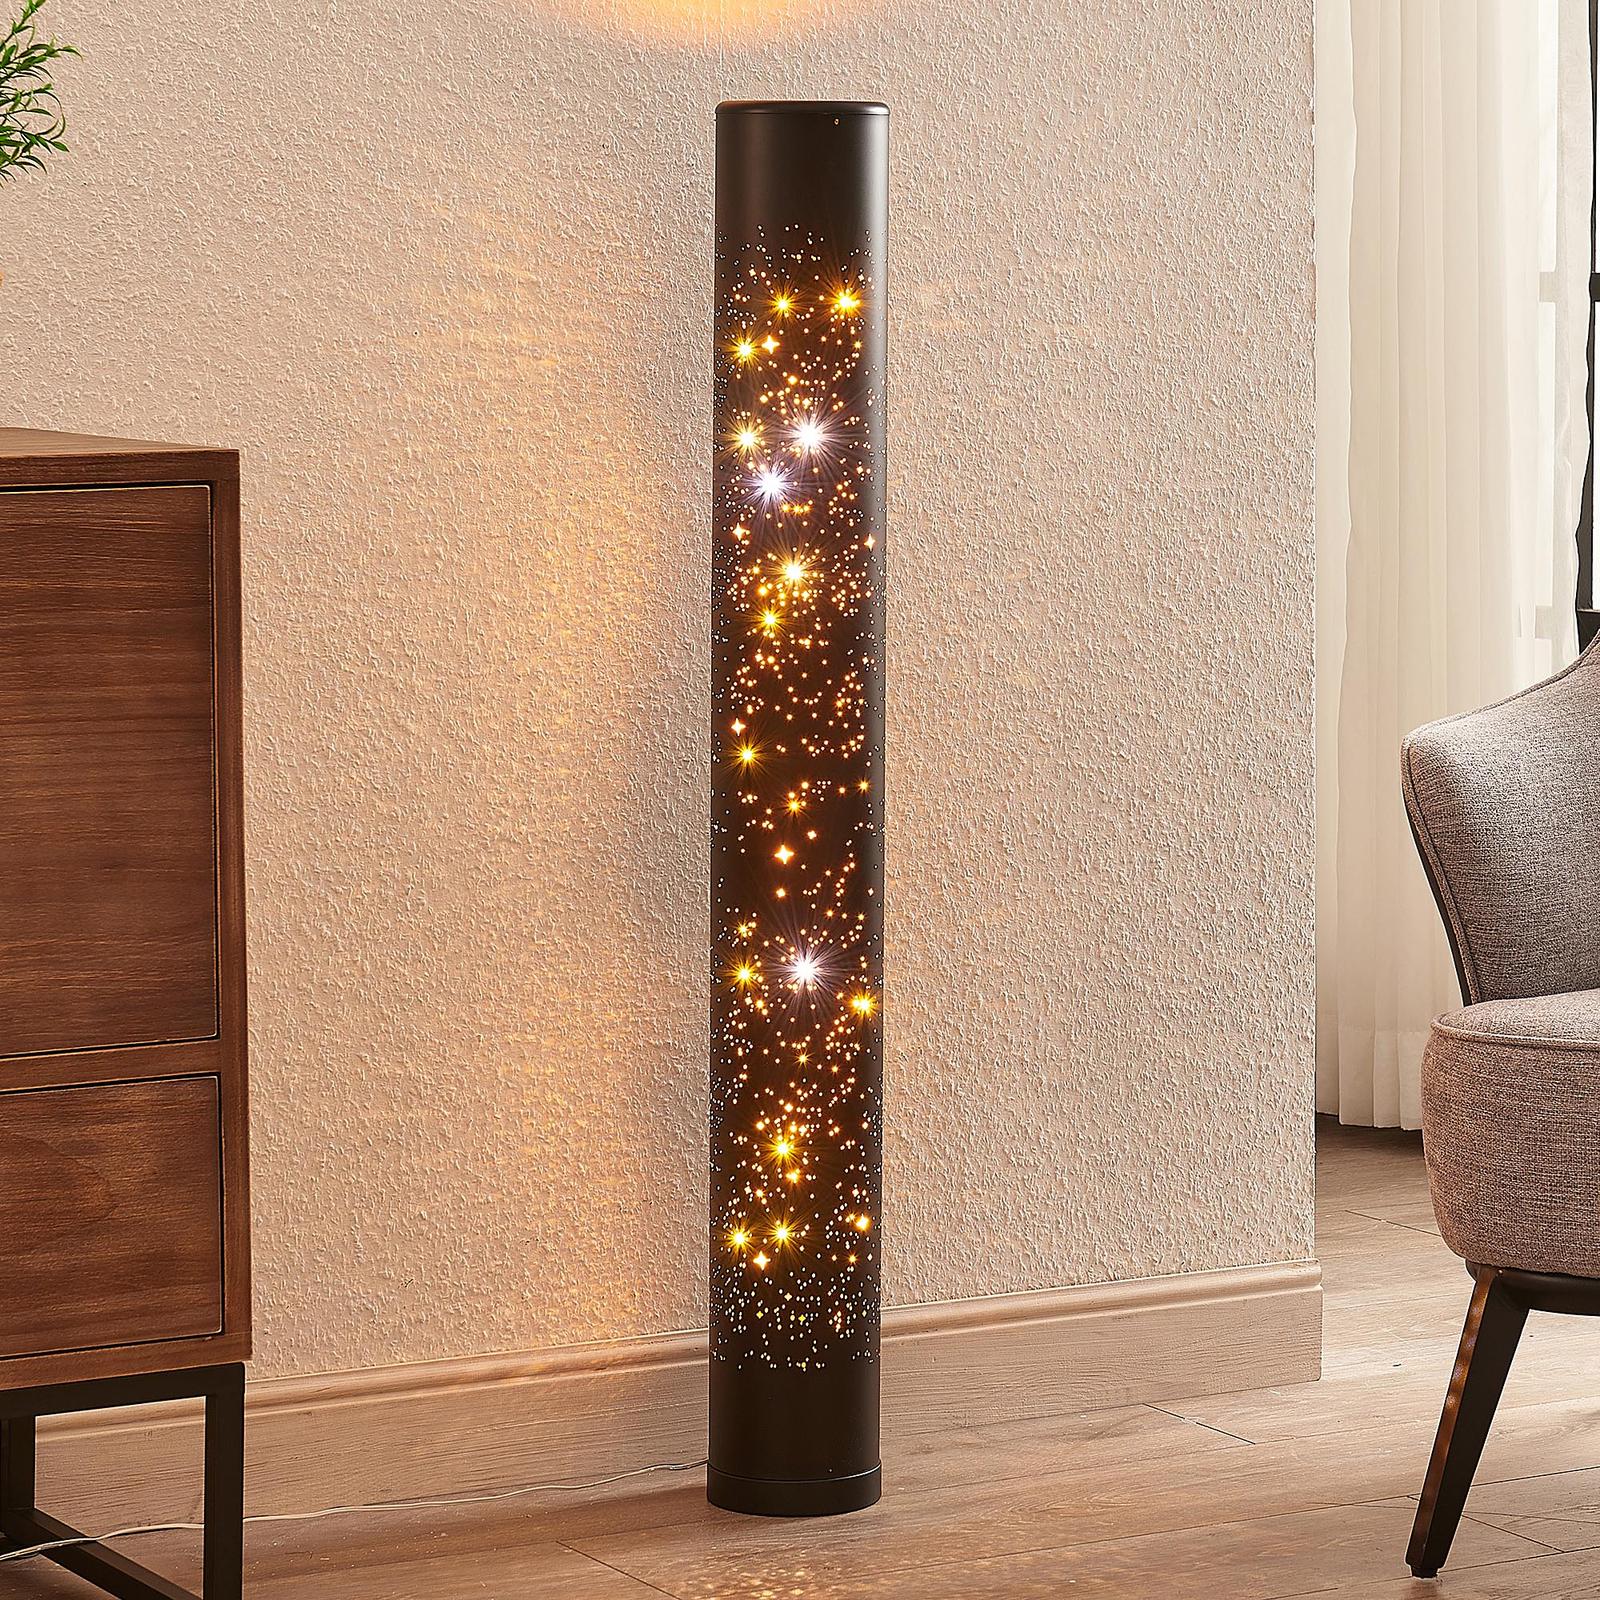 Lindby Lengla LED-Stehleuchte in Schwarz